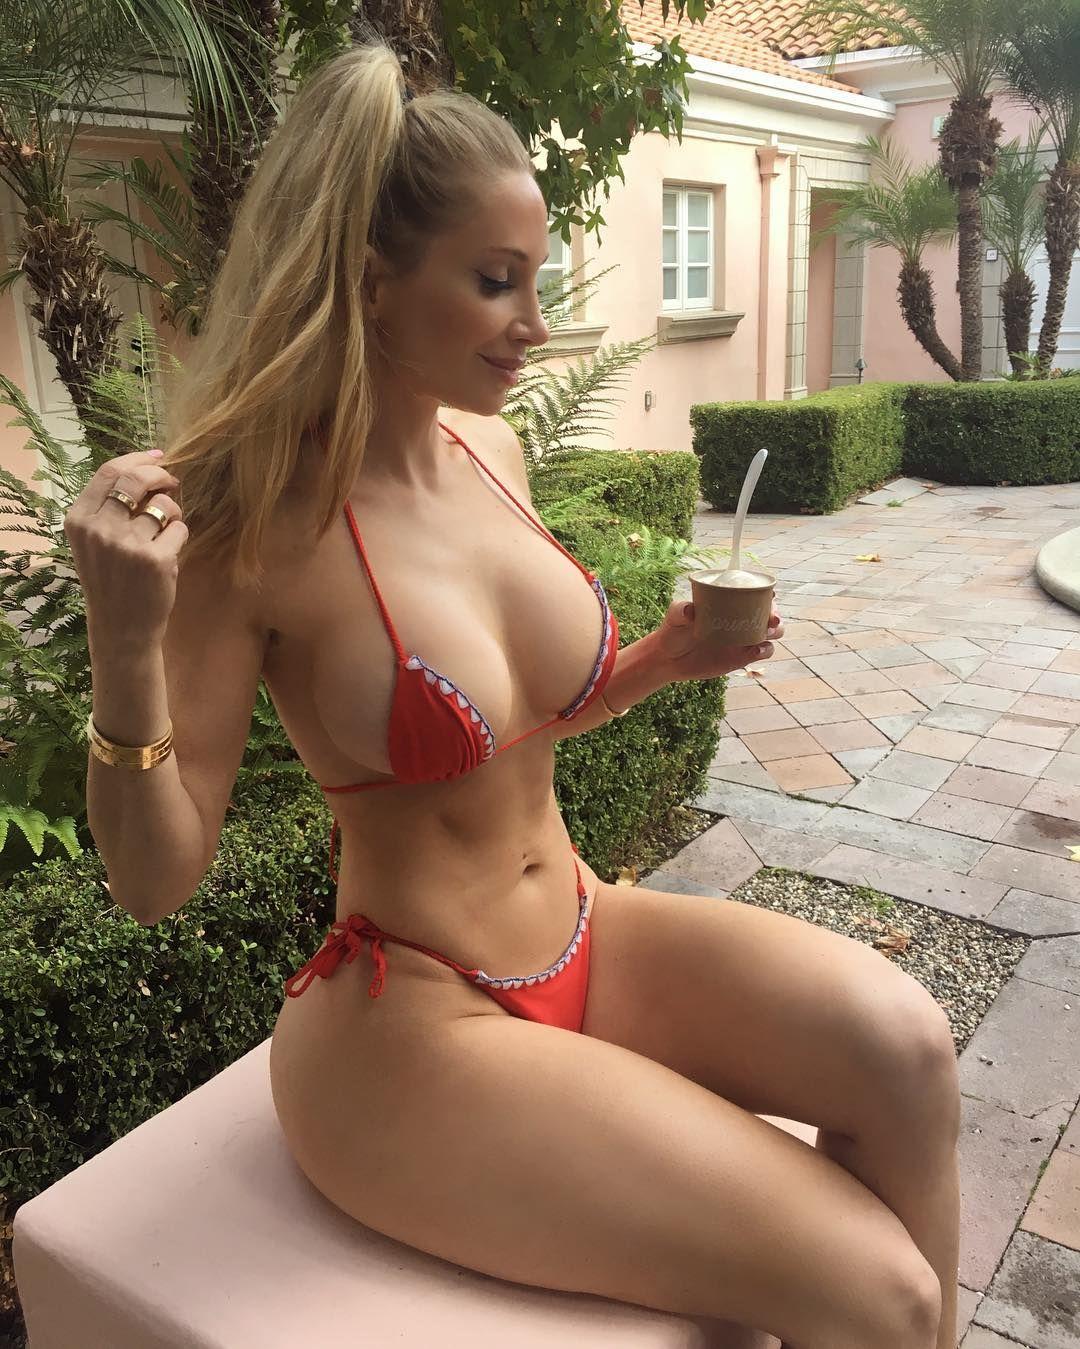 e39a70e402ac Pin de paco en pretty girls   Mujeres guapas, Chicas en bikini y ...